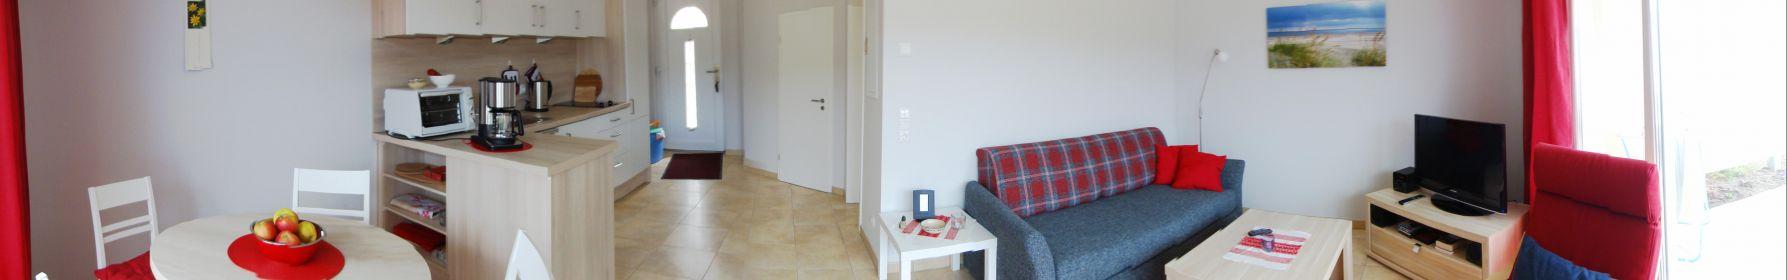 k stenwald ferienwohnung abendsonne. Black Bedroom Furniture Sets. Home Design Ideas